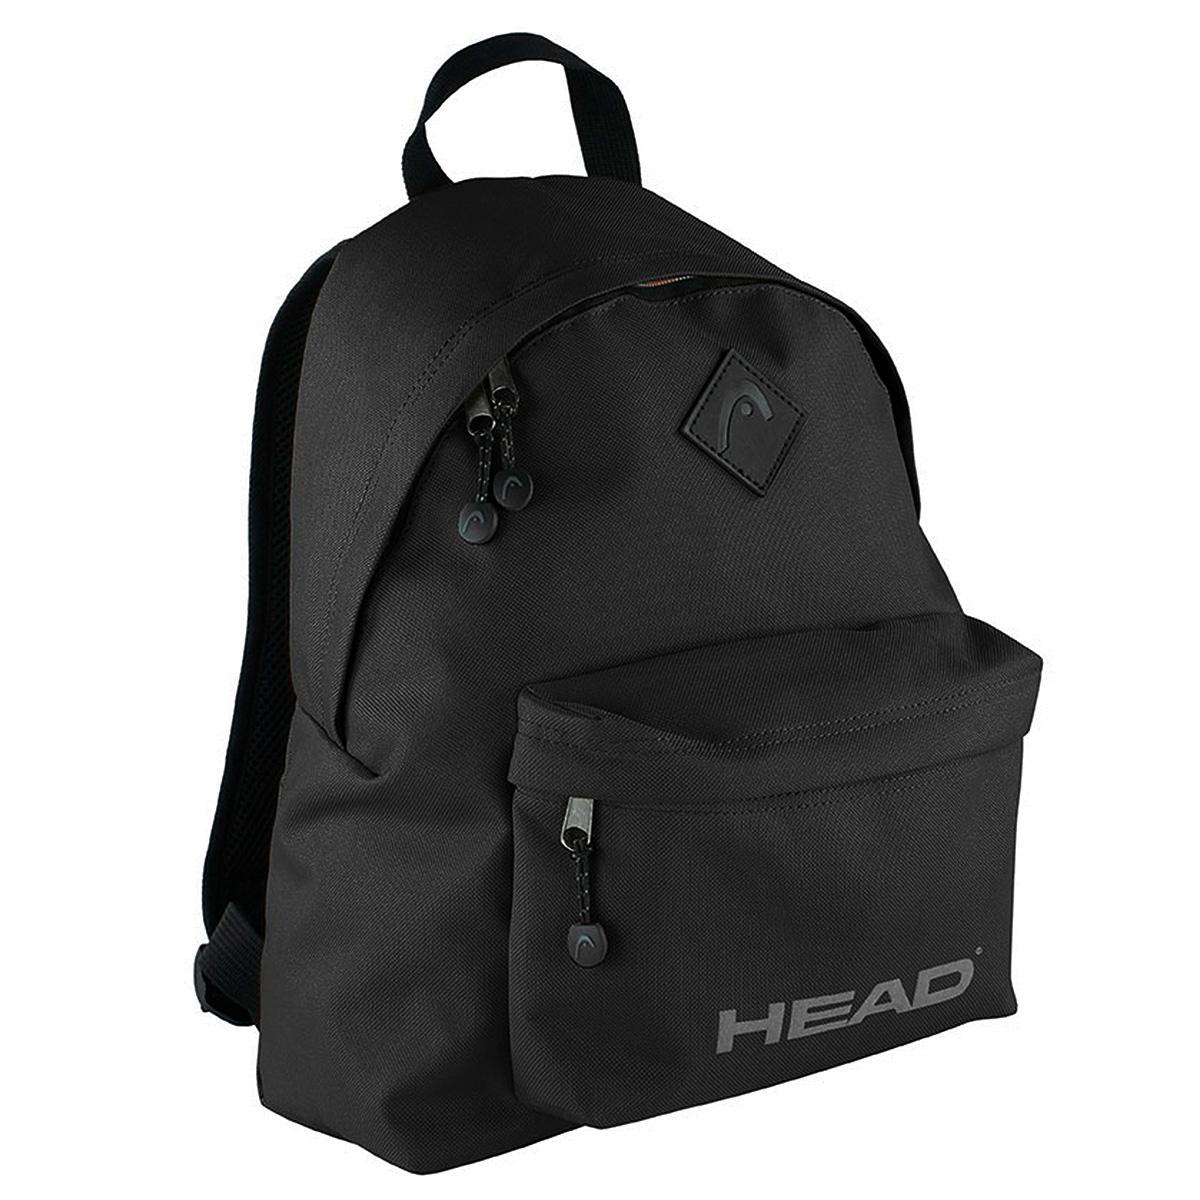 Head Spirit Rucksack Backpack Daypack H501903